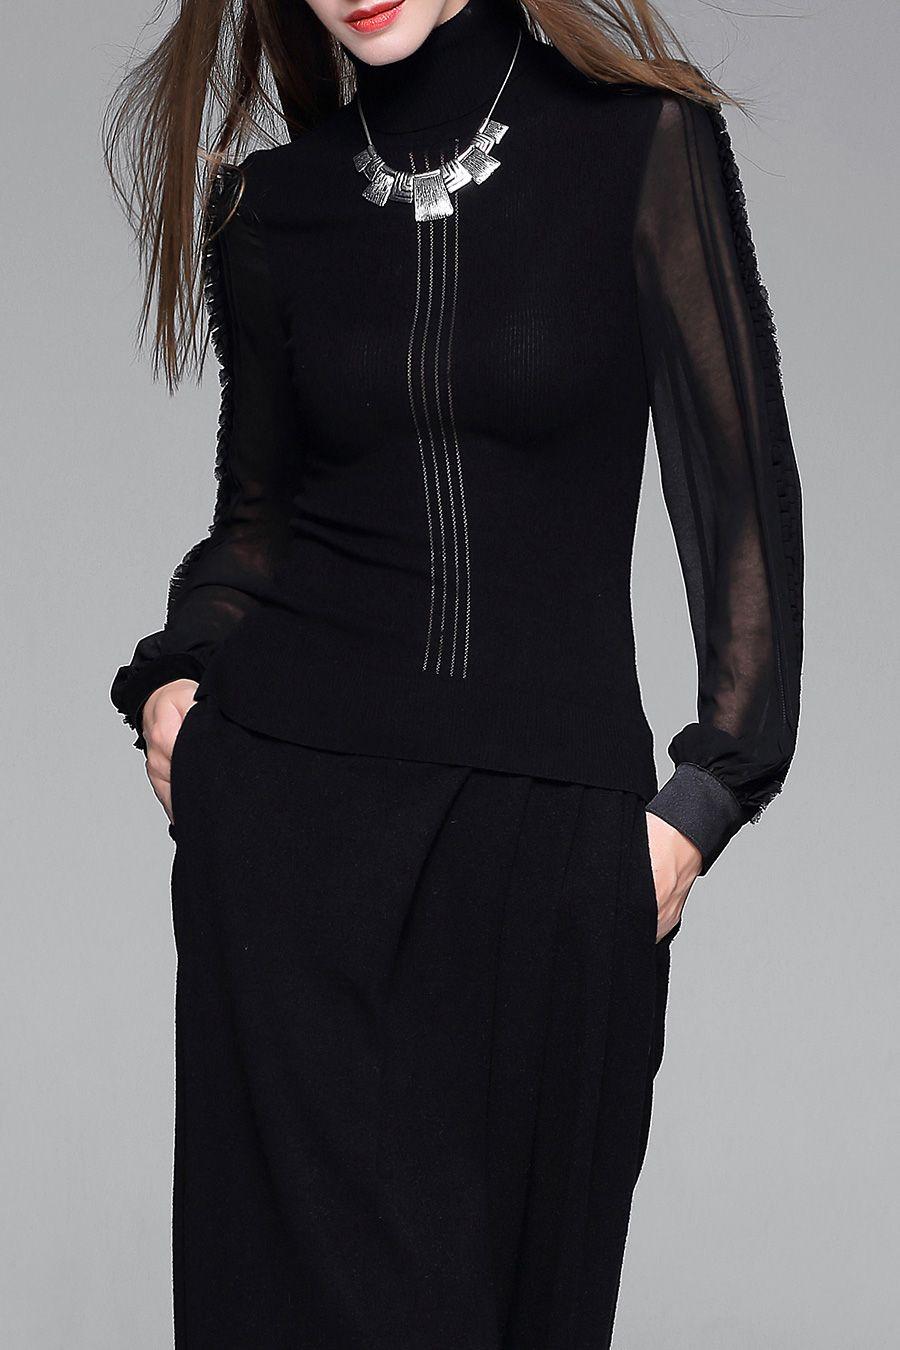 Weiguoyue see through turtleneck sweater lovely fashion